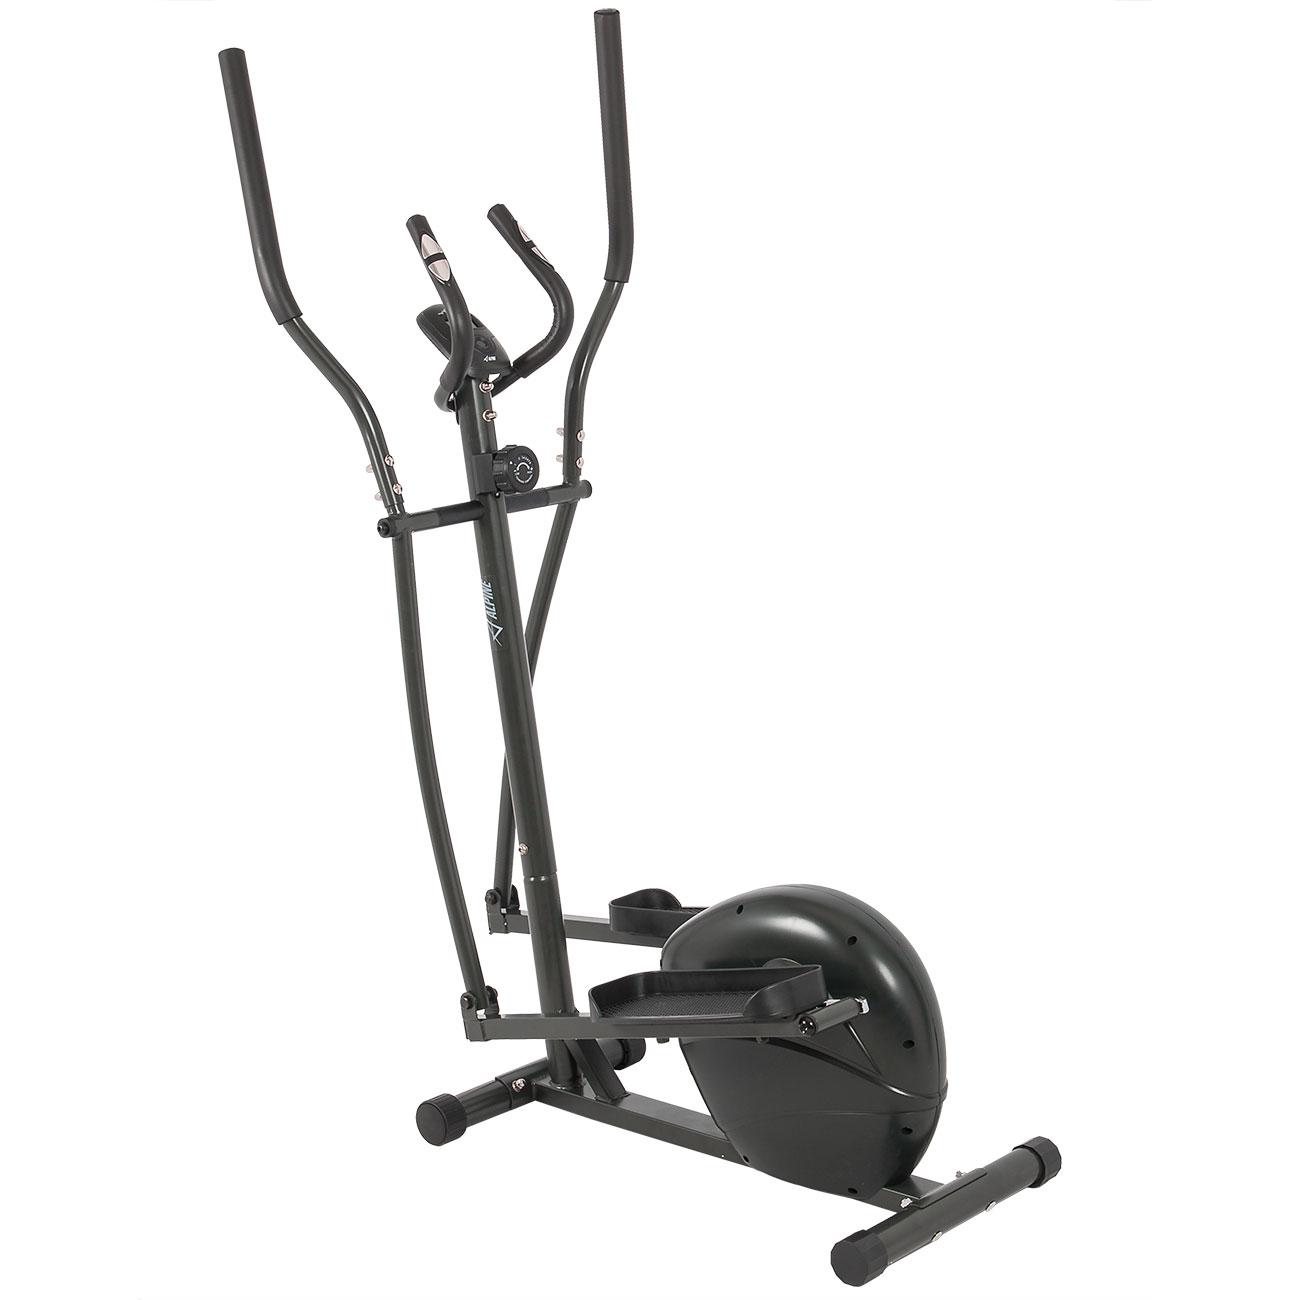 Elliptical Bike Types: Elliptical Magnetic Trainer Machine Exercise Workout